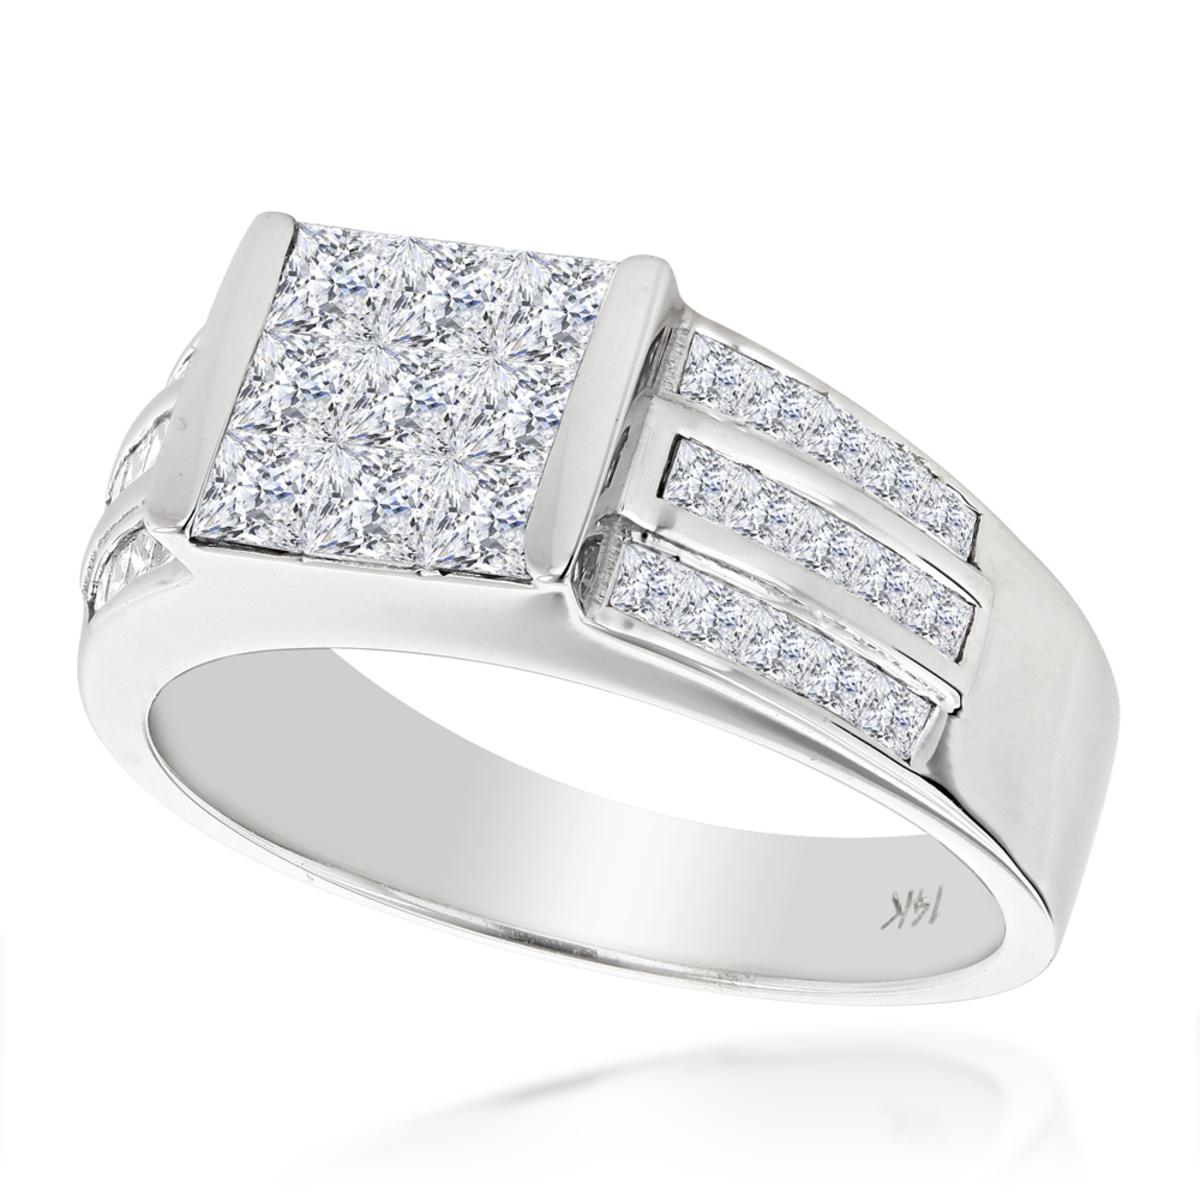 14K Gold Princess Cut Diamond Ring 1.75ct Unique Wedding Band